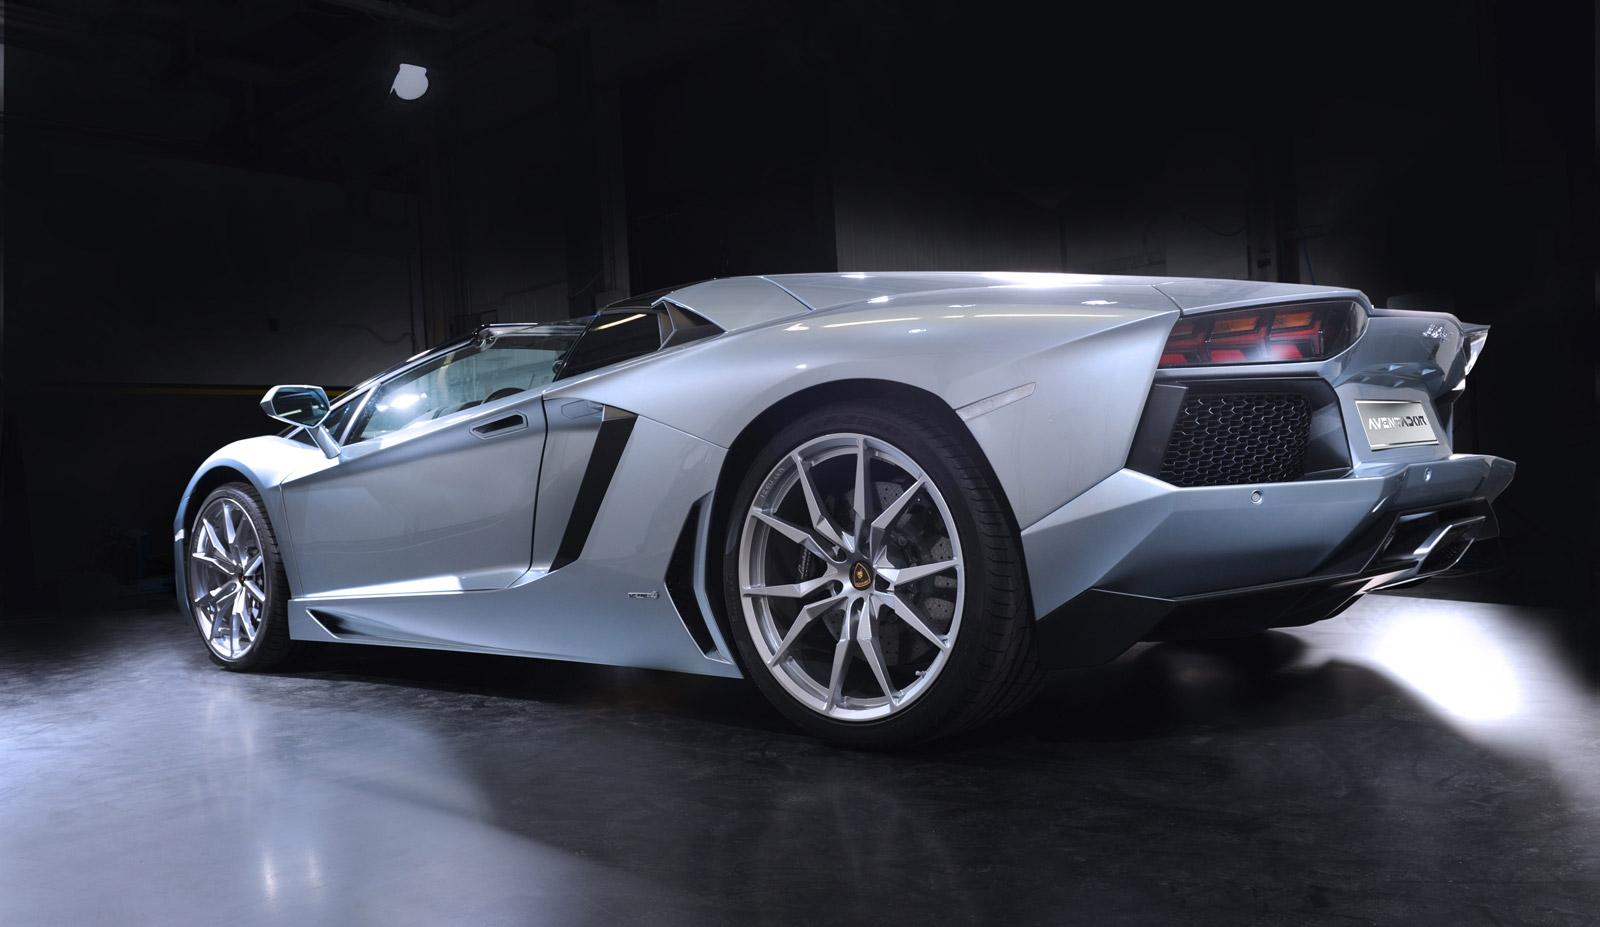 Https News 1080508 Lap The Circuit Of 110v 220v Small Ultrasonic Board Hd Walls Find Wallpapers Lamborghini Aventador Lp 700 4 Roadster 100409122 H